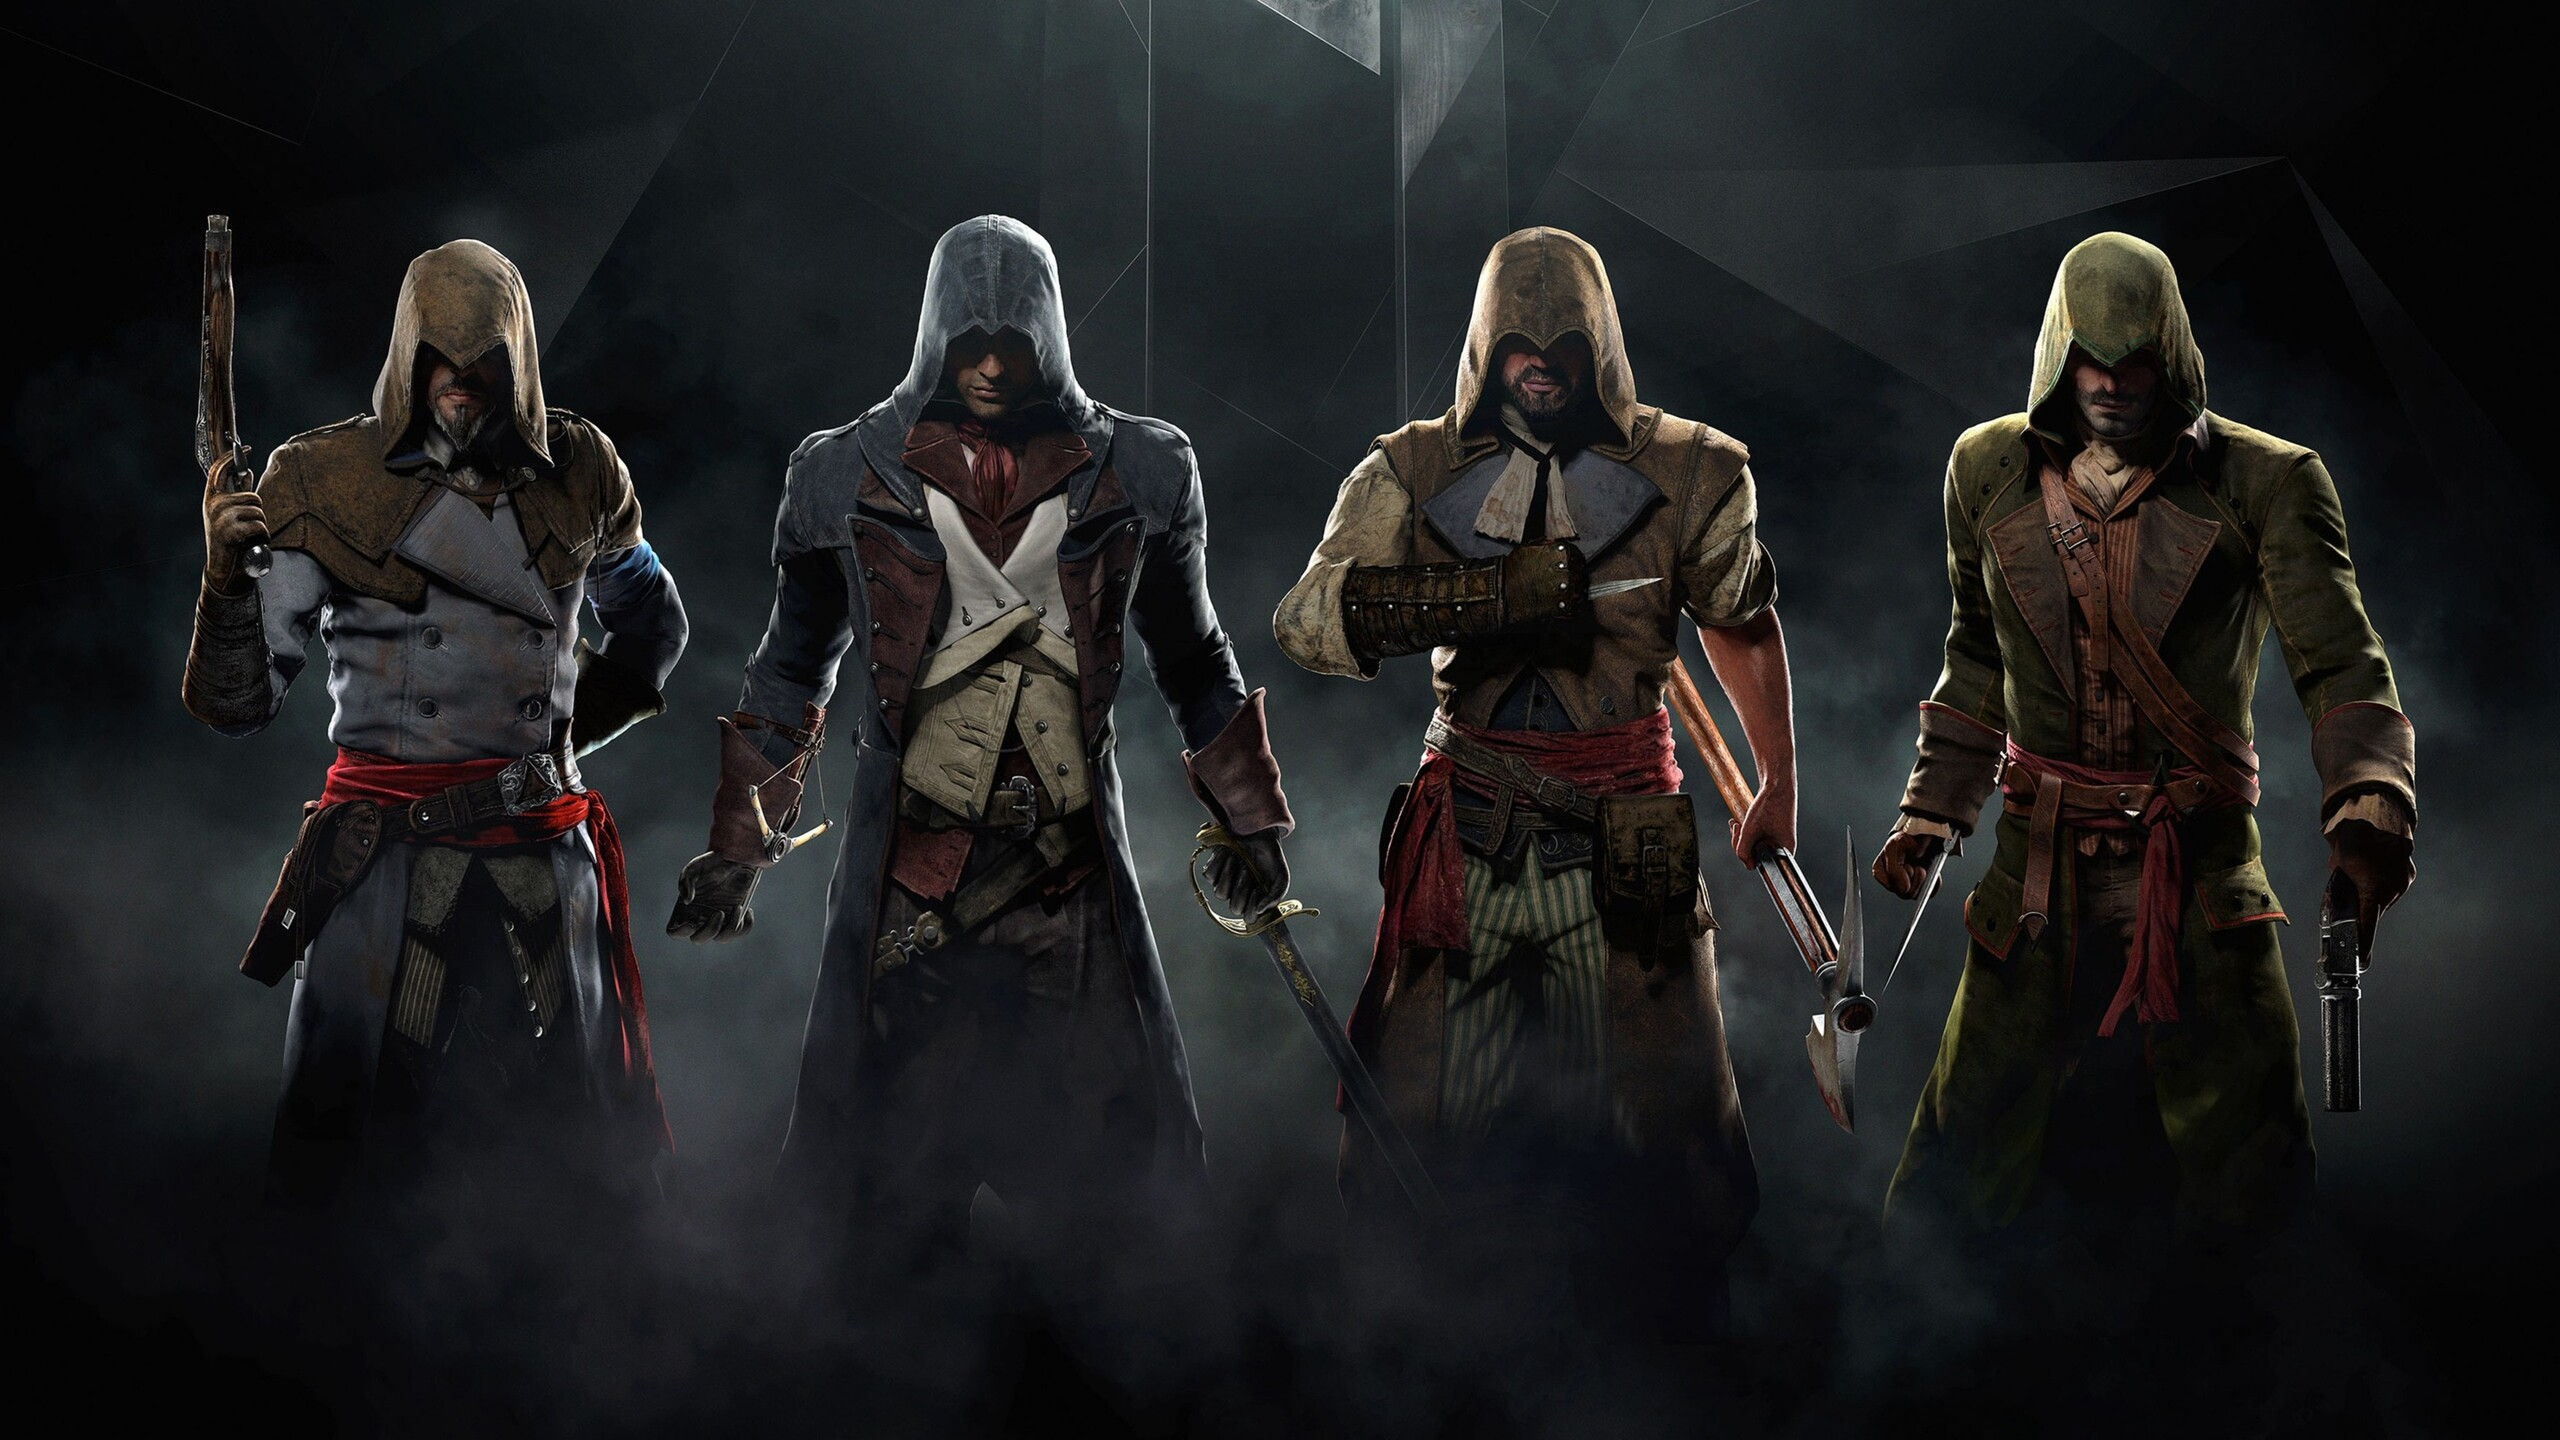 2560x1440 assassins creed unity game desktop 1440p